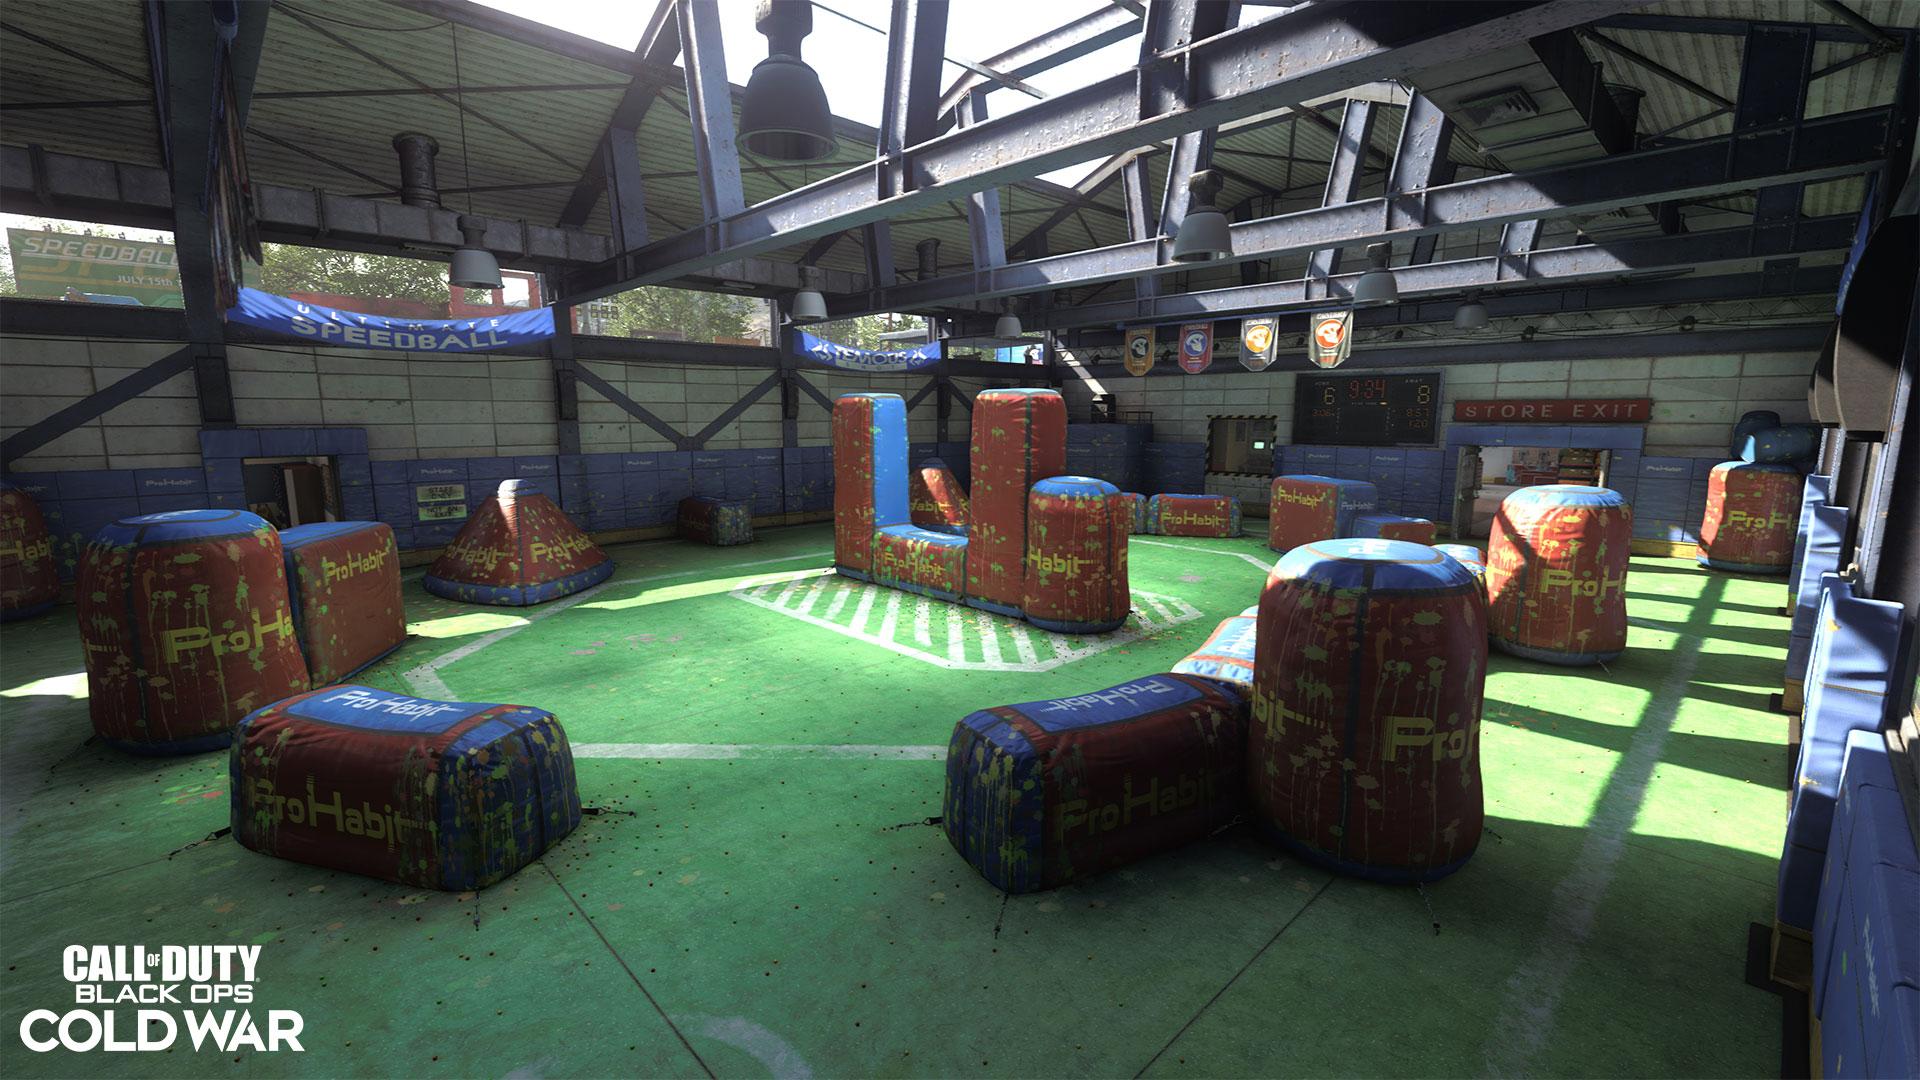 An indoor paintball range